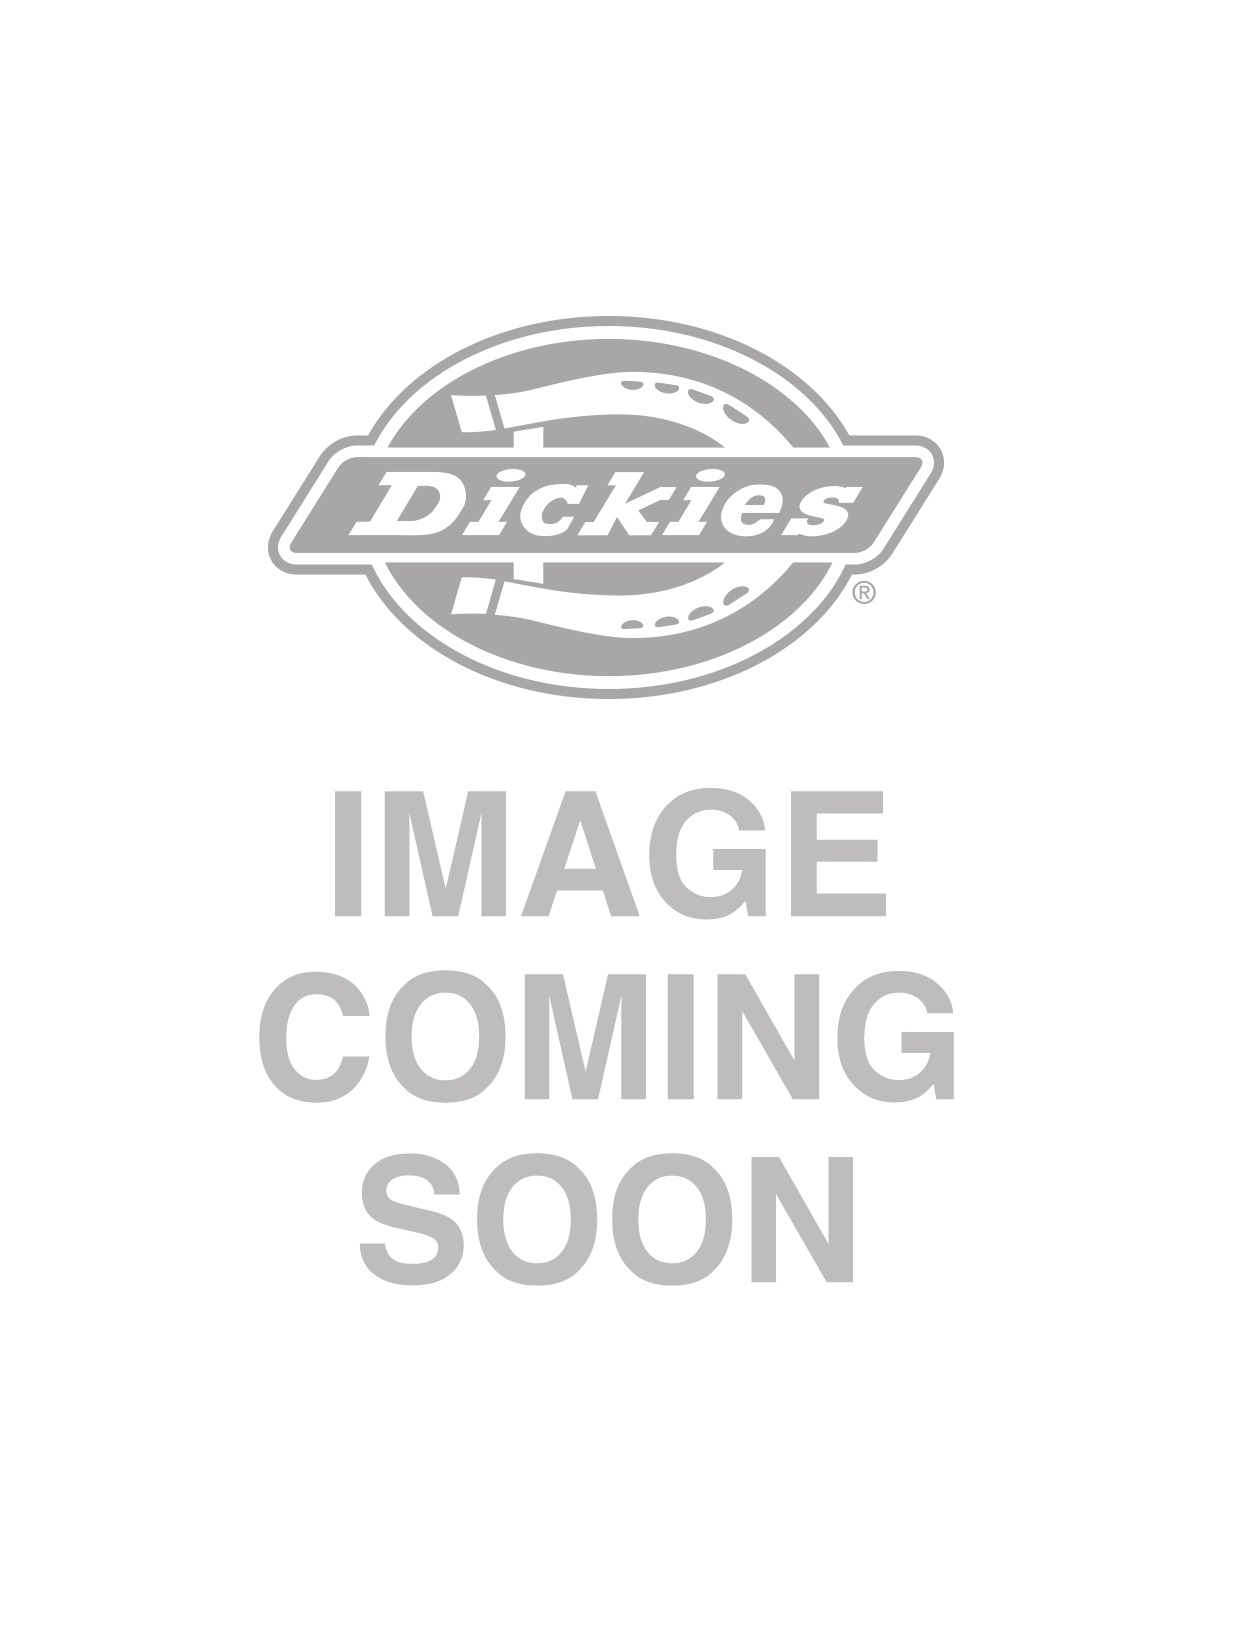 Dickies Edgeworth Beanie